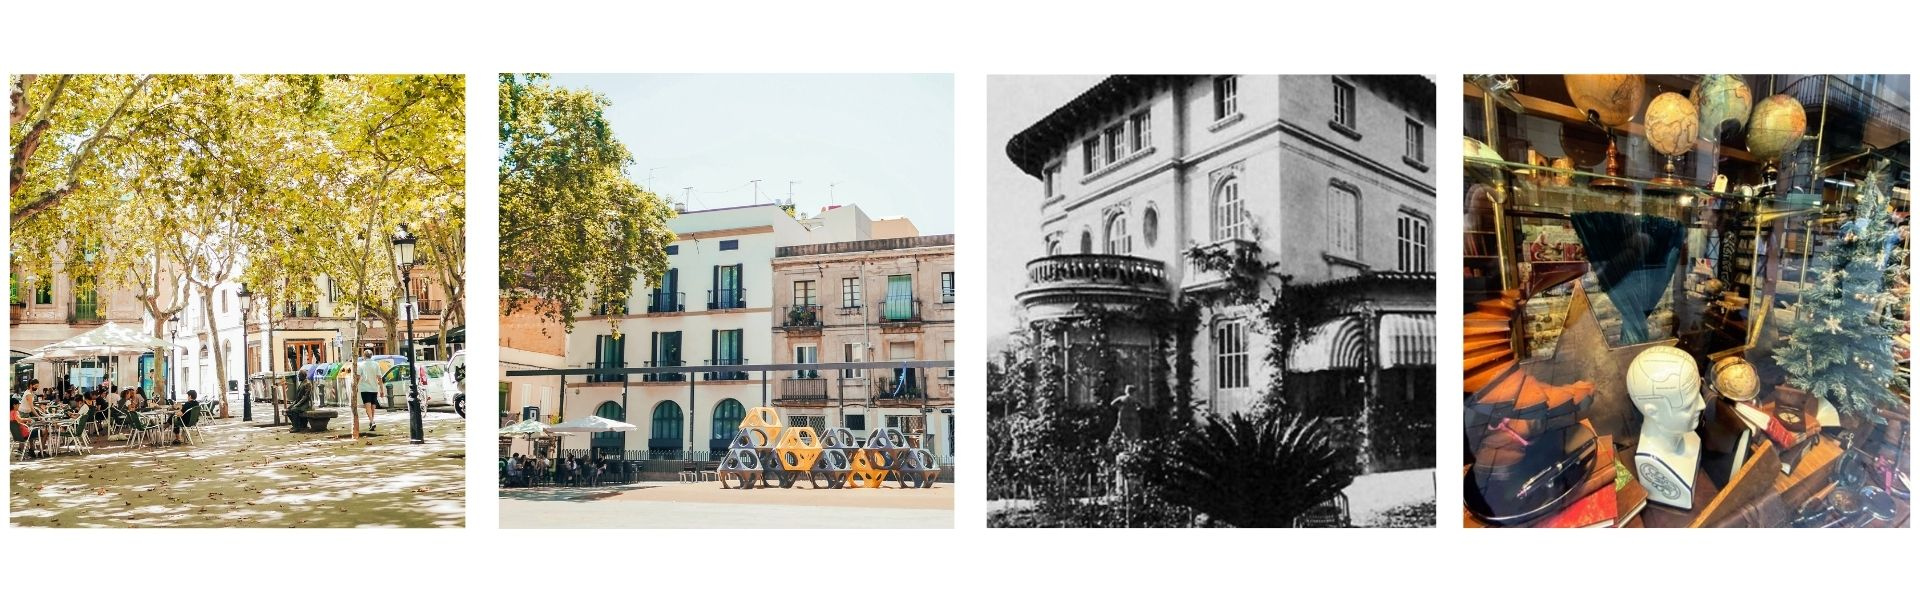 Barcelona rutas literarias